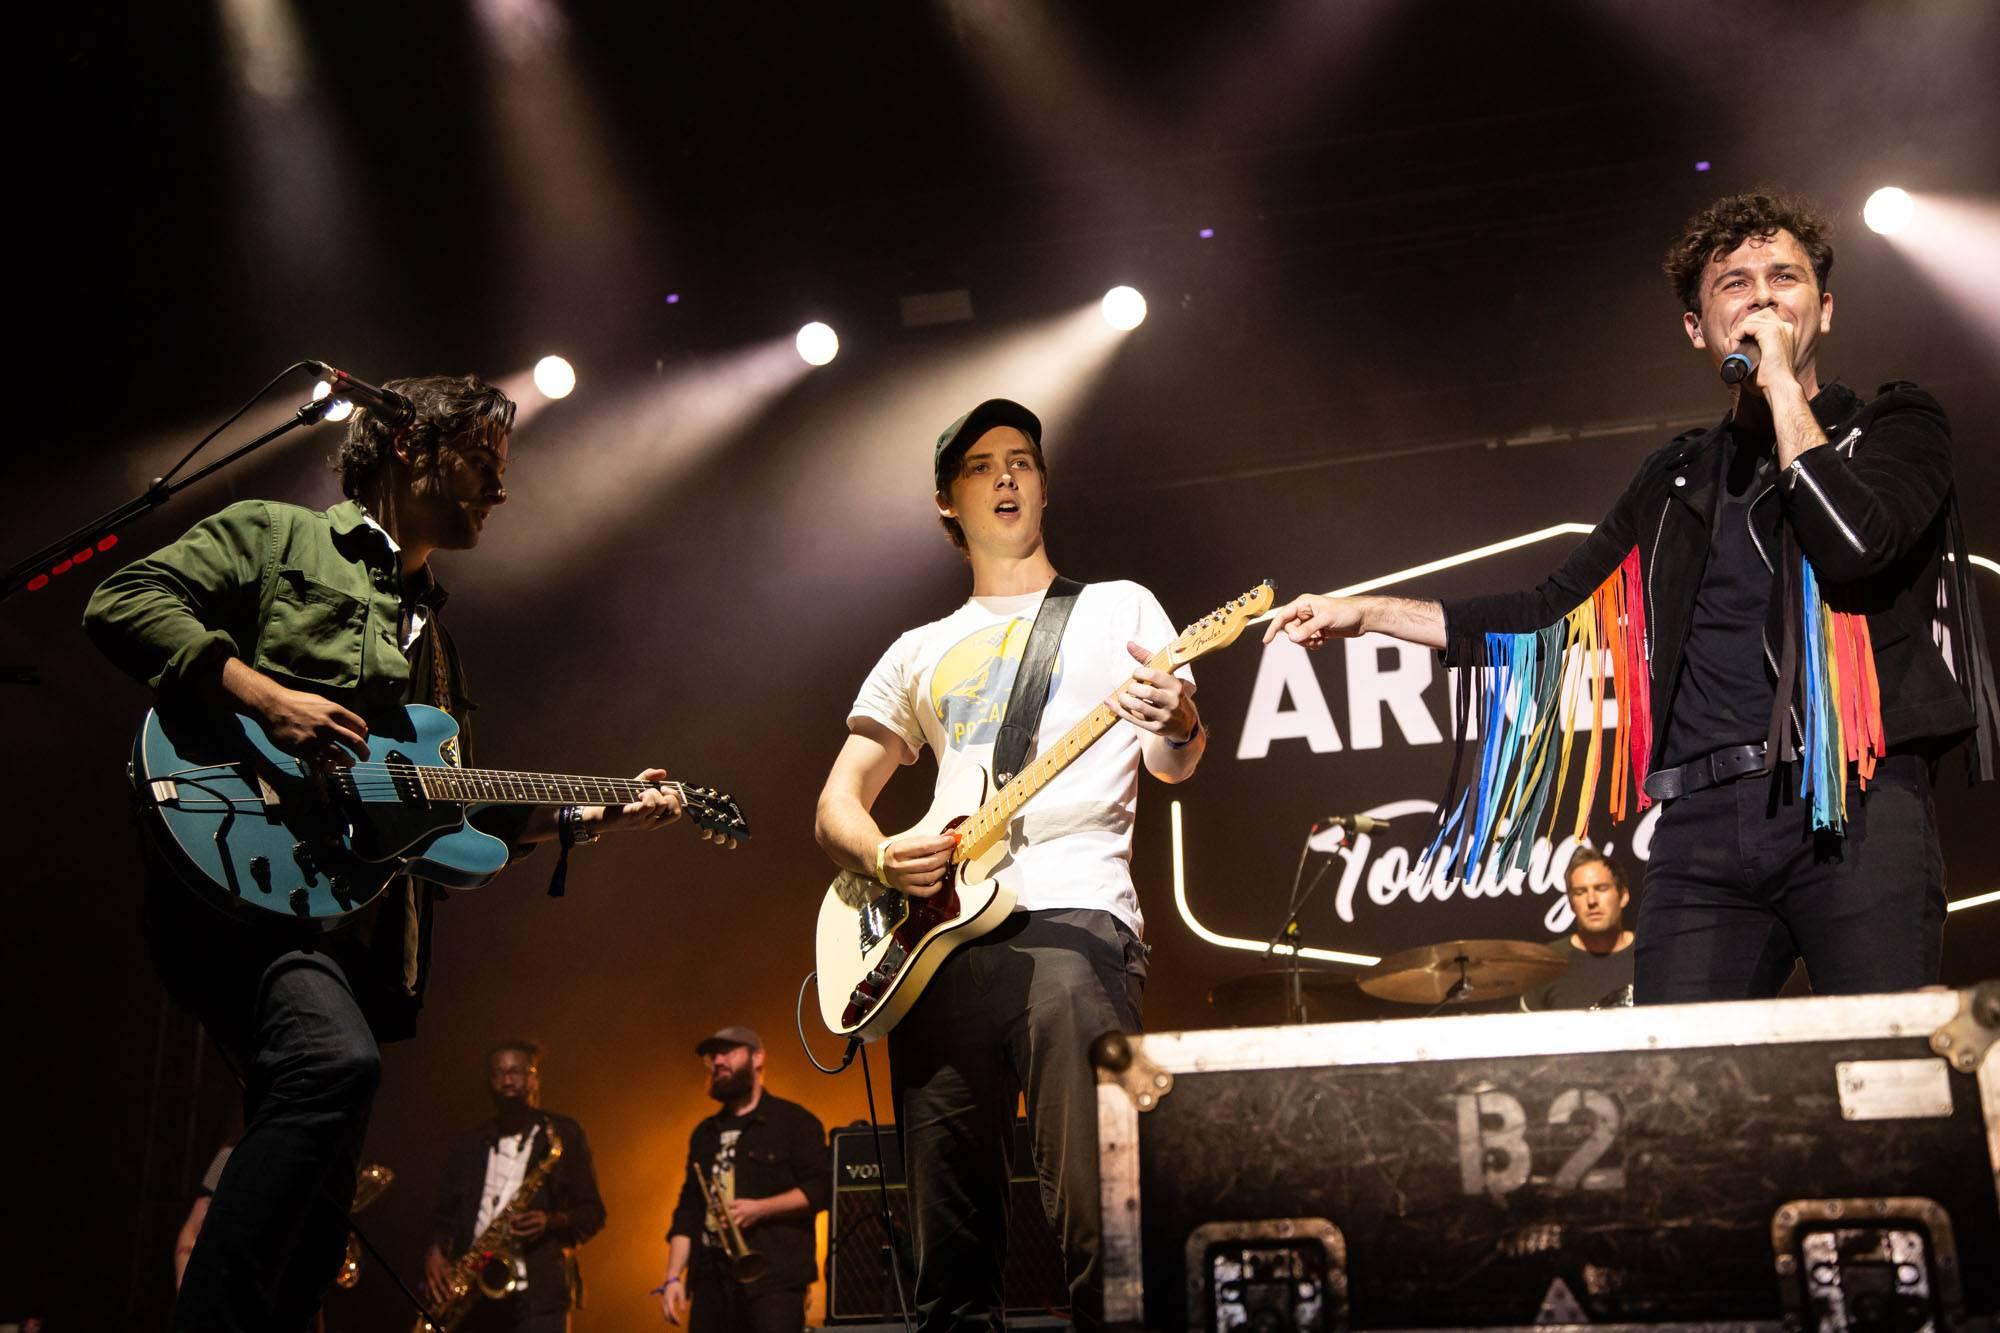 Arkells at Skookum Festival, Vancouver, Sep 7 2018. Kirk Chantraine photo.